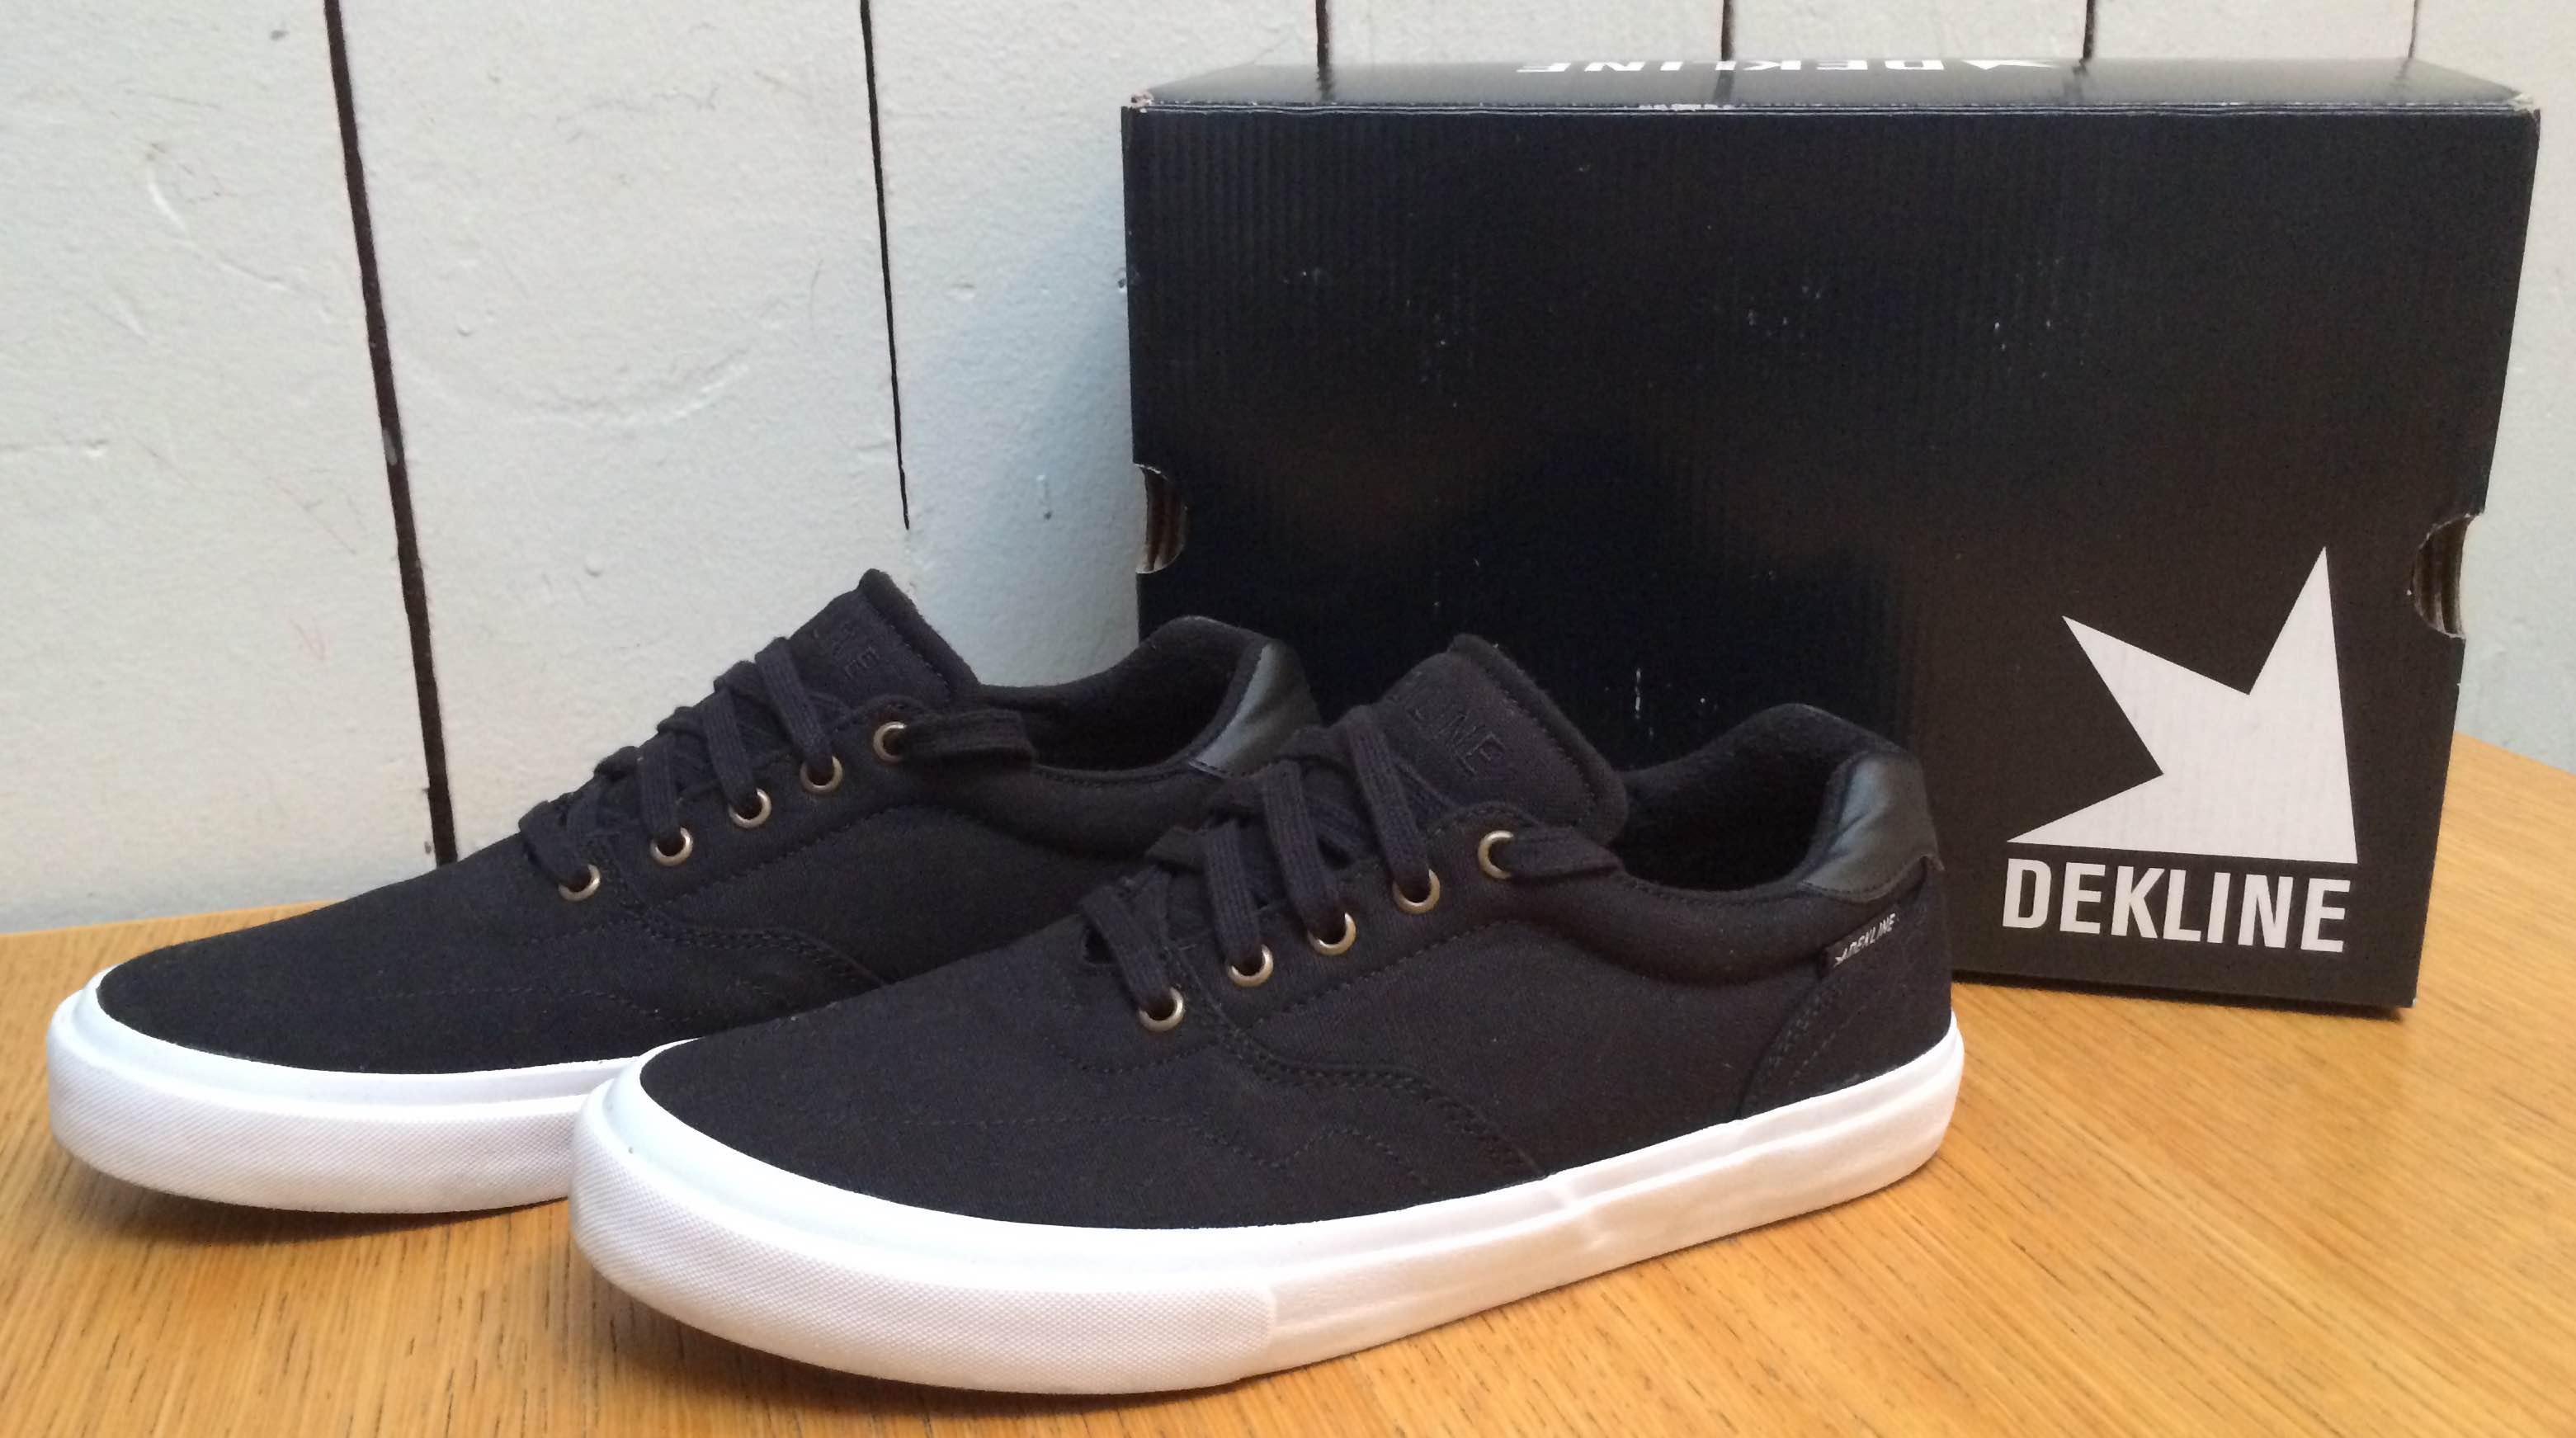 Dekline Vegan Skateboard shoes